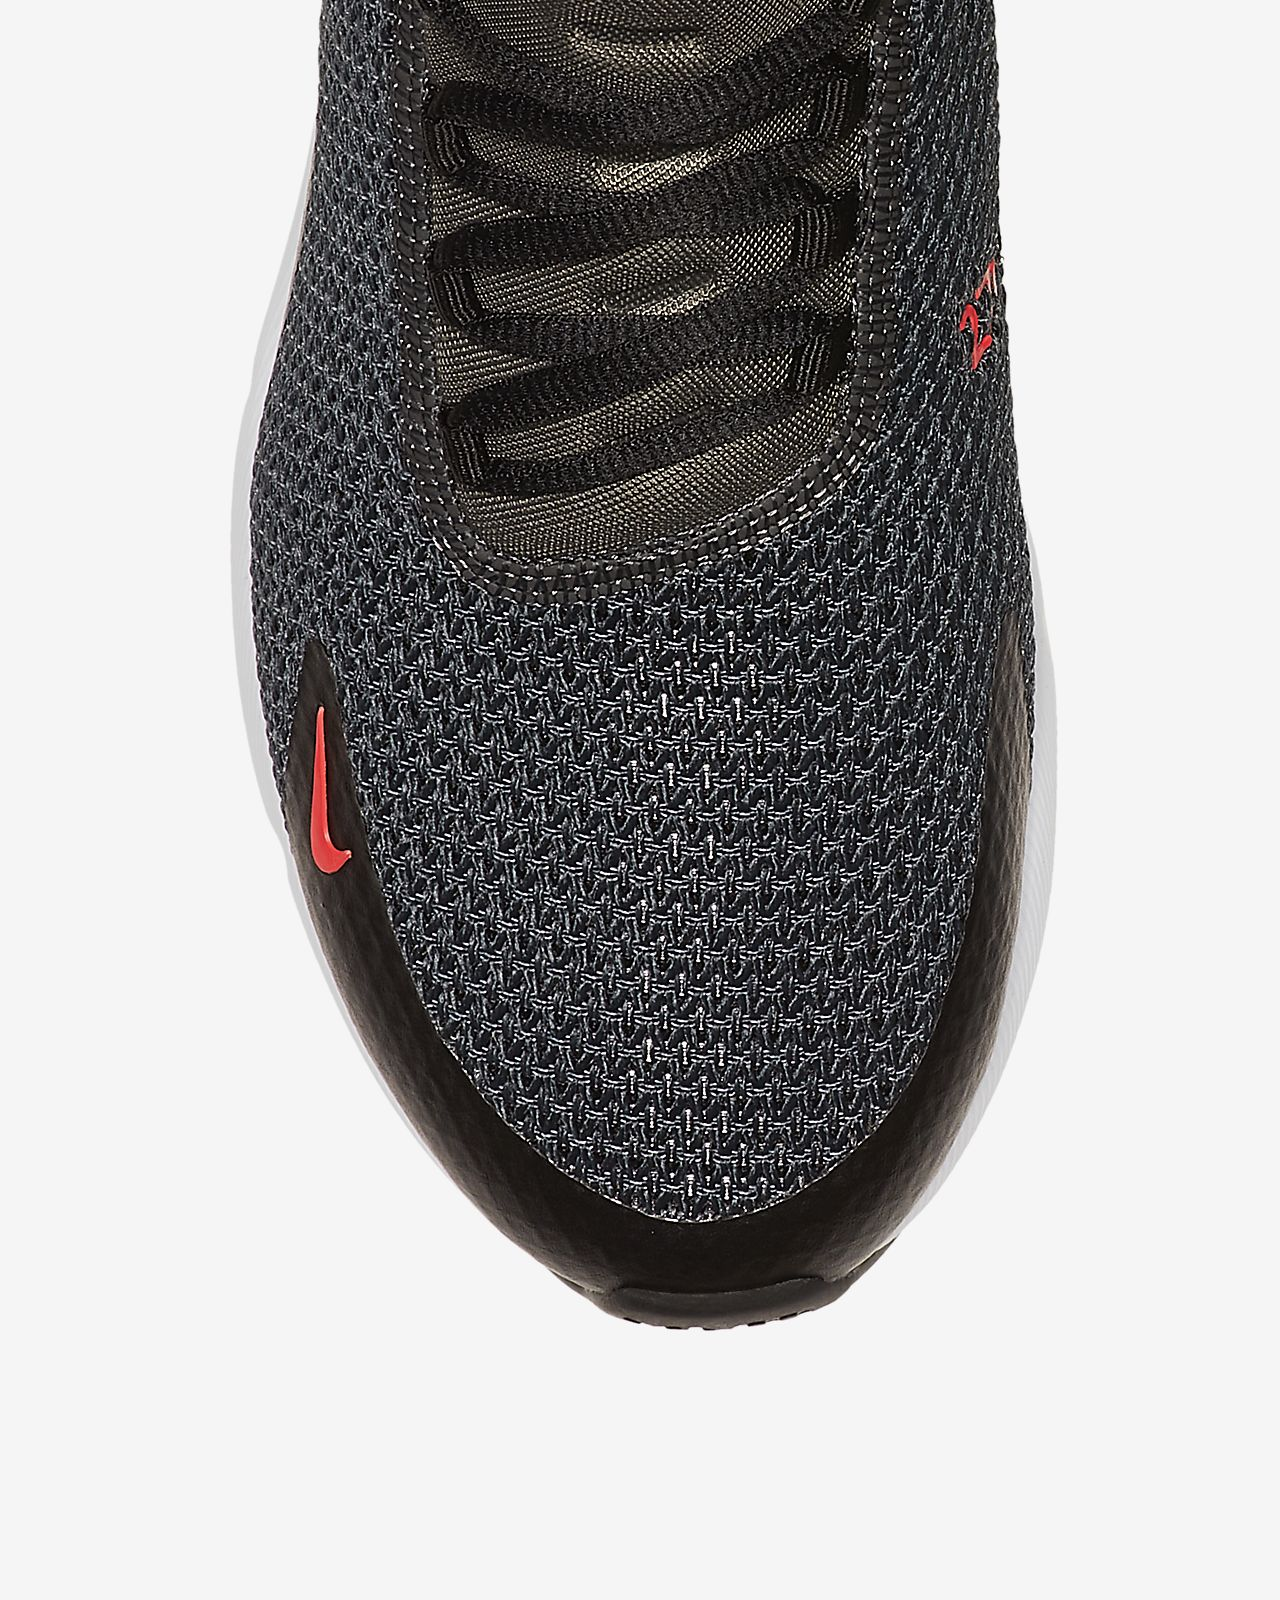 cheap for discount 2ae4d ce332 ... Nike Air Max 270 SE Men s Shoe